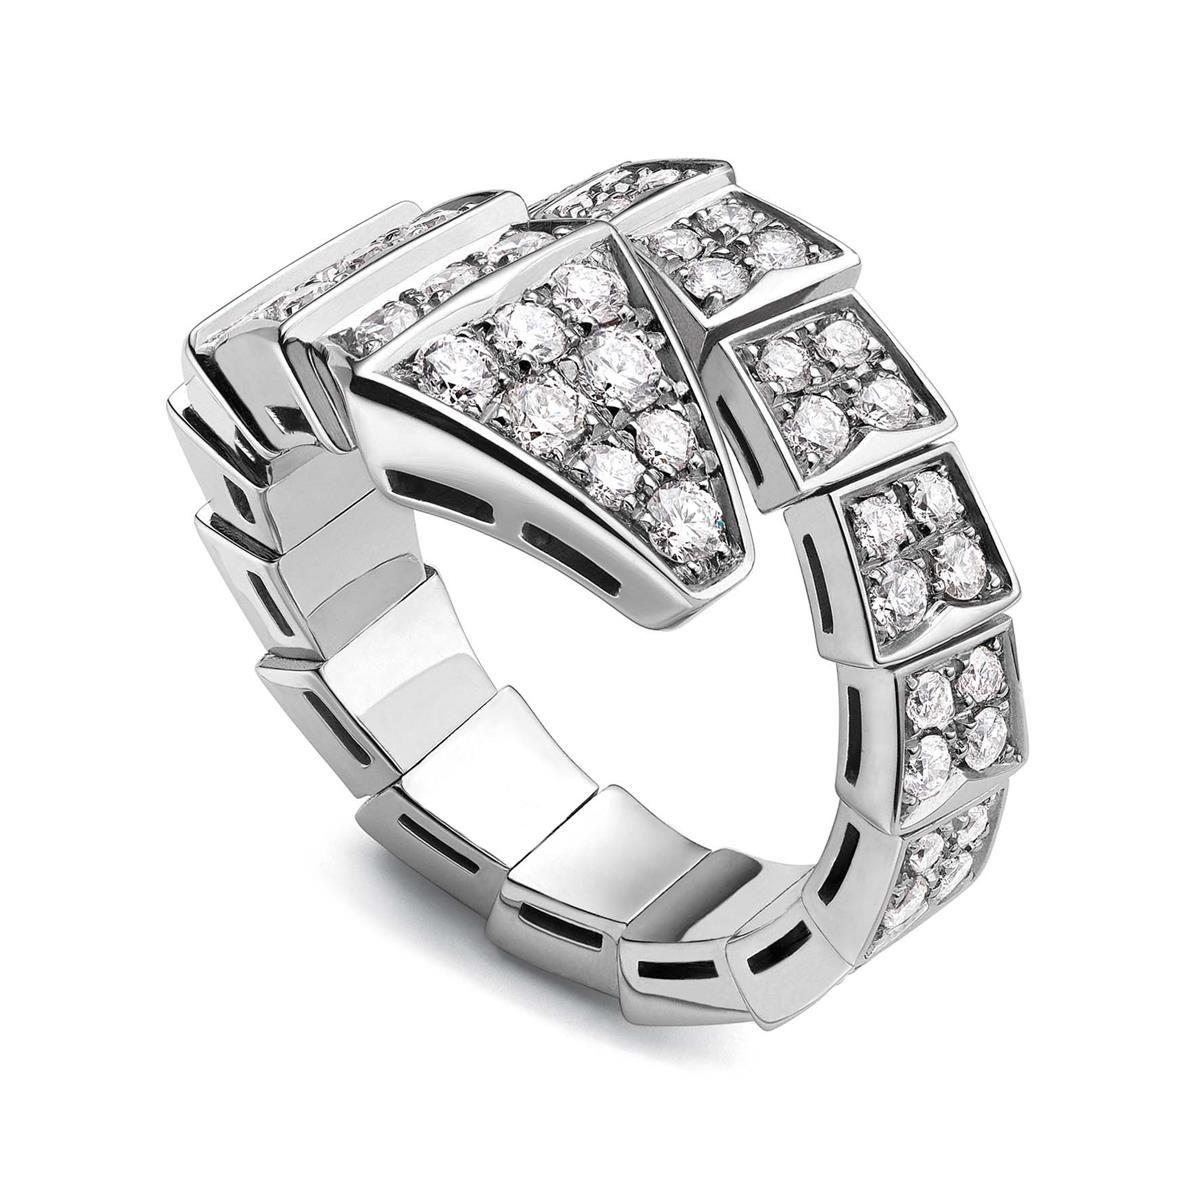 408ca06b26ef7 Configure Bulgari Serpenti Medium White Gold All Diamond Ring